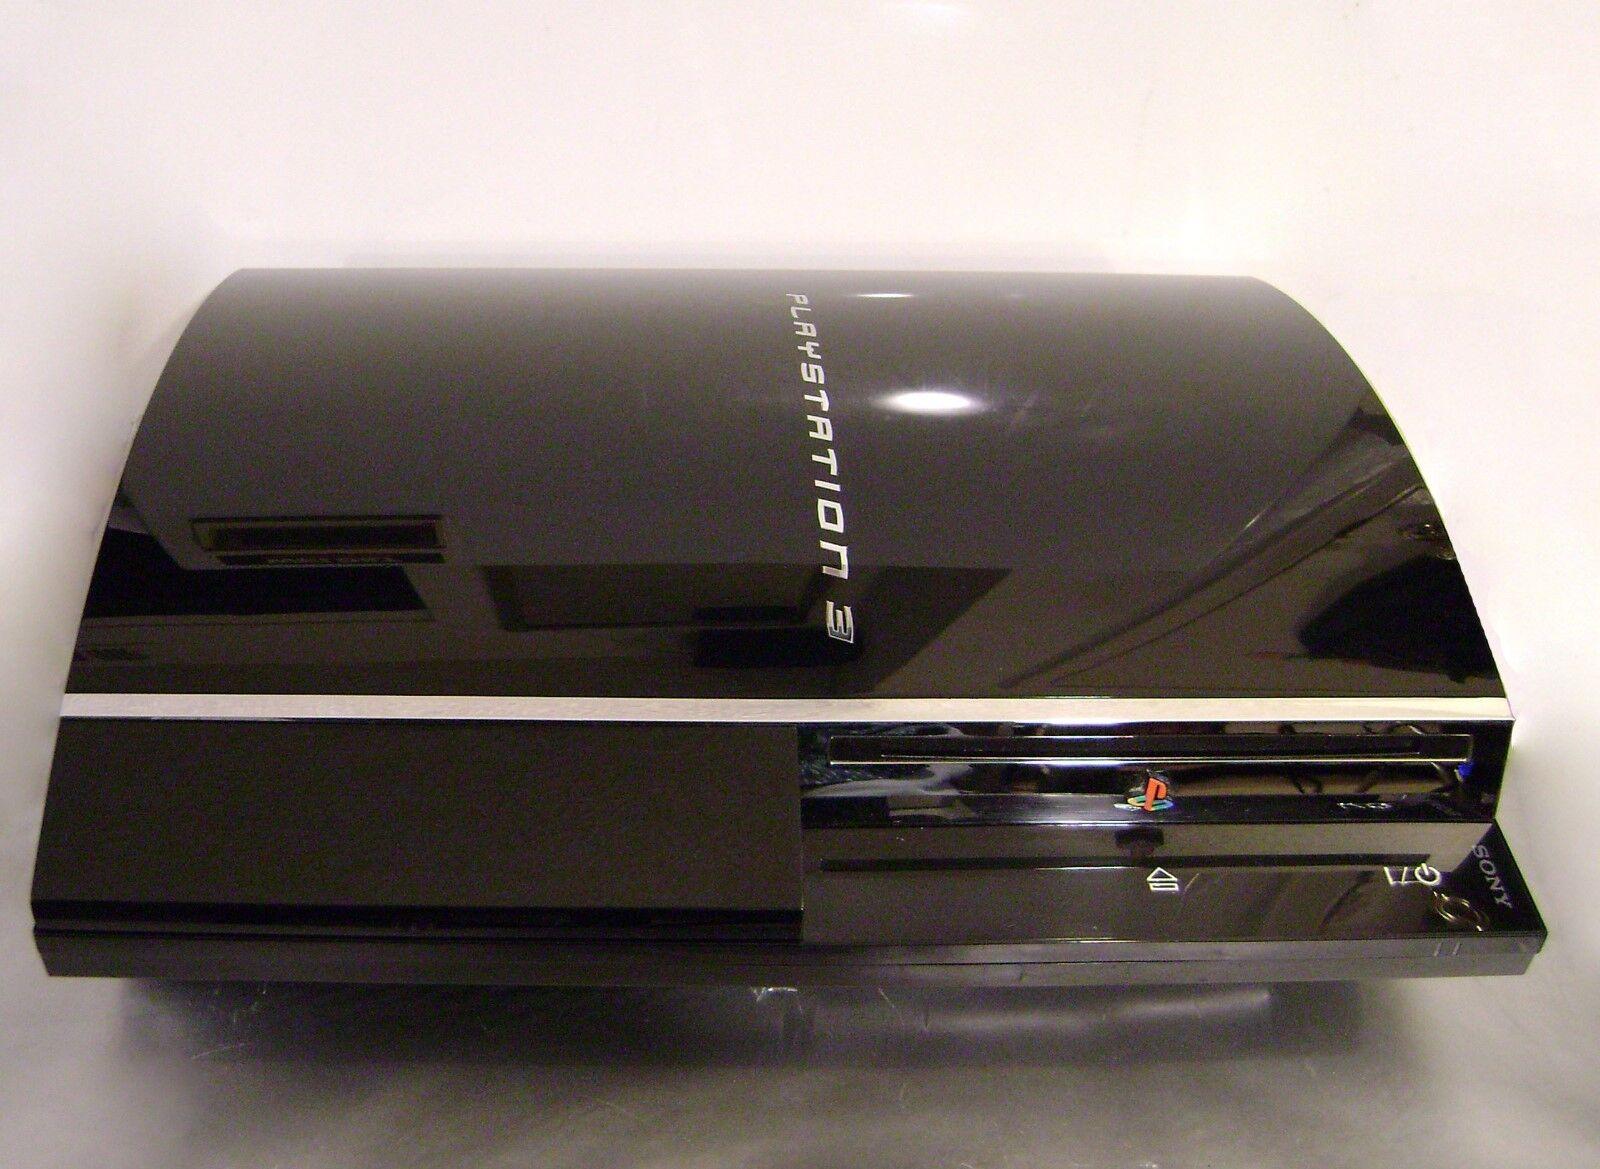 Playstation 3 - Playstation3 Full Backward Compatible CECHA01 LATEST FIRMWARE 60GB LEADED SOLDER